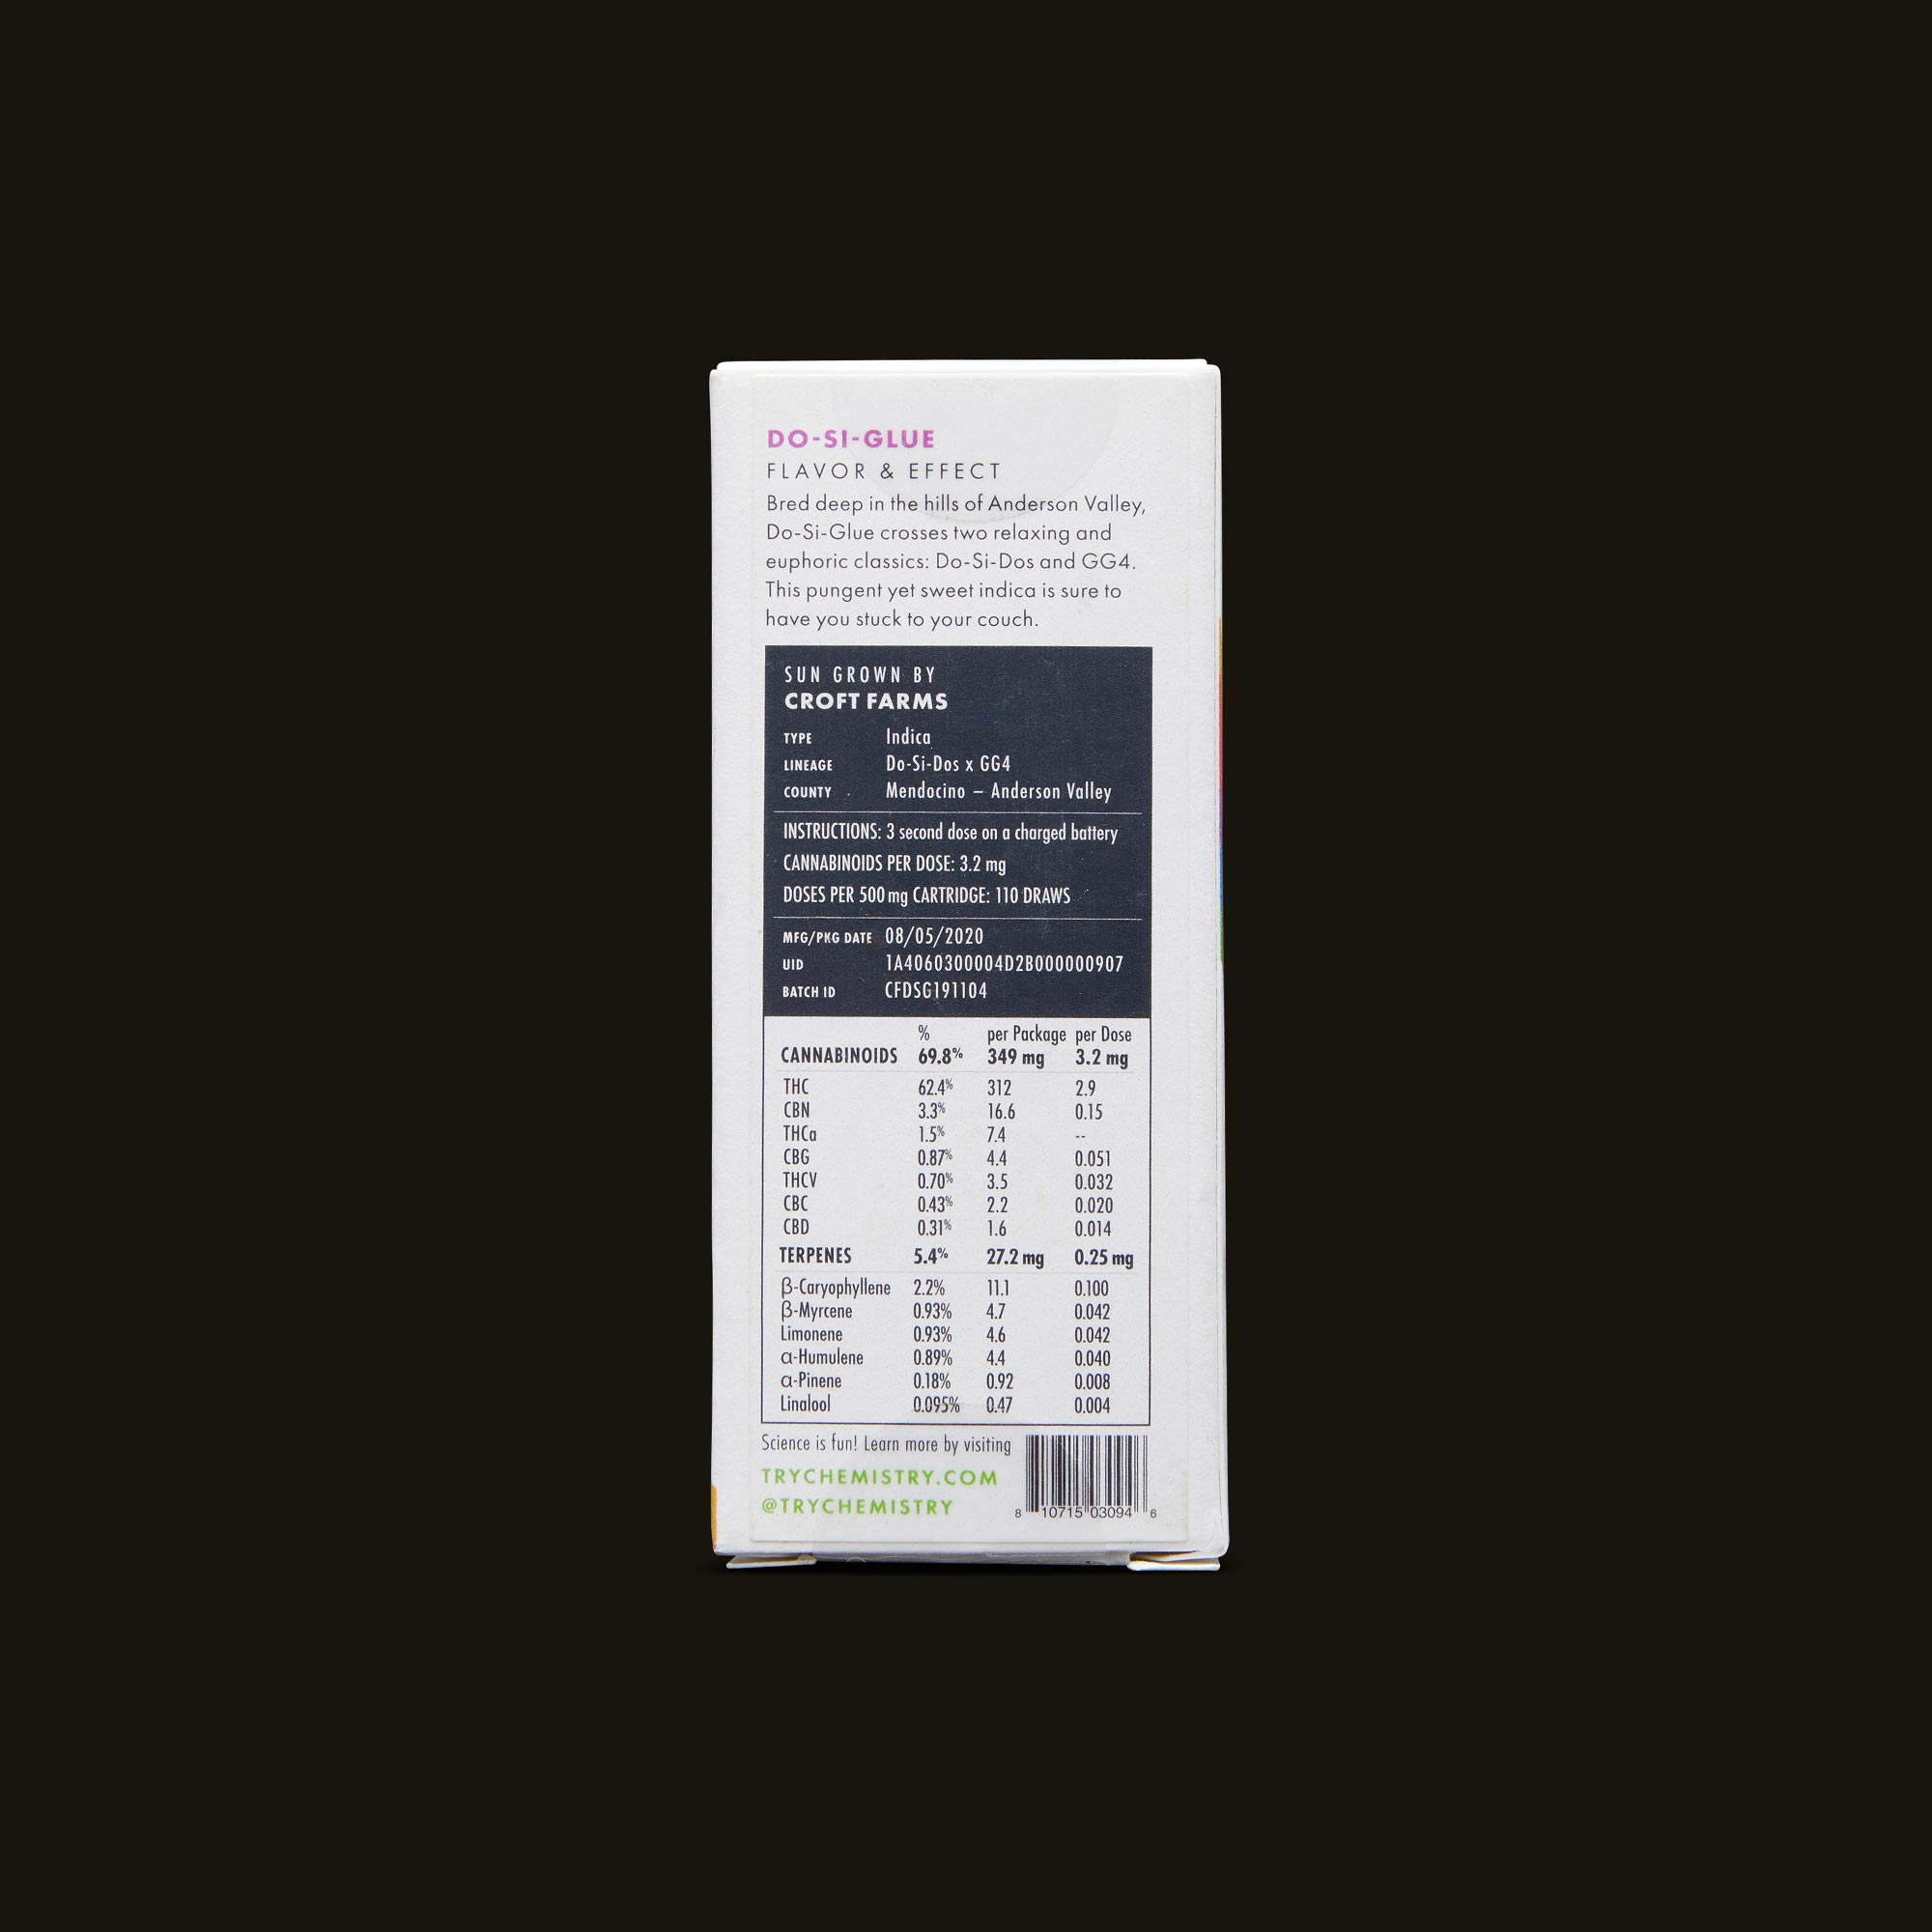 Chemistry Do-Si-Glue Cartridge Ingredients